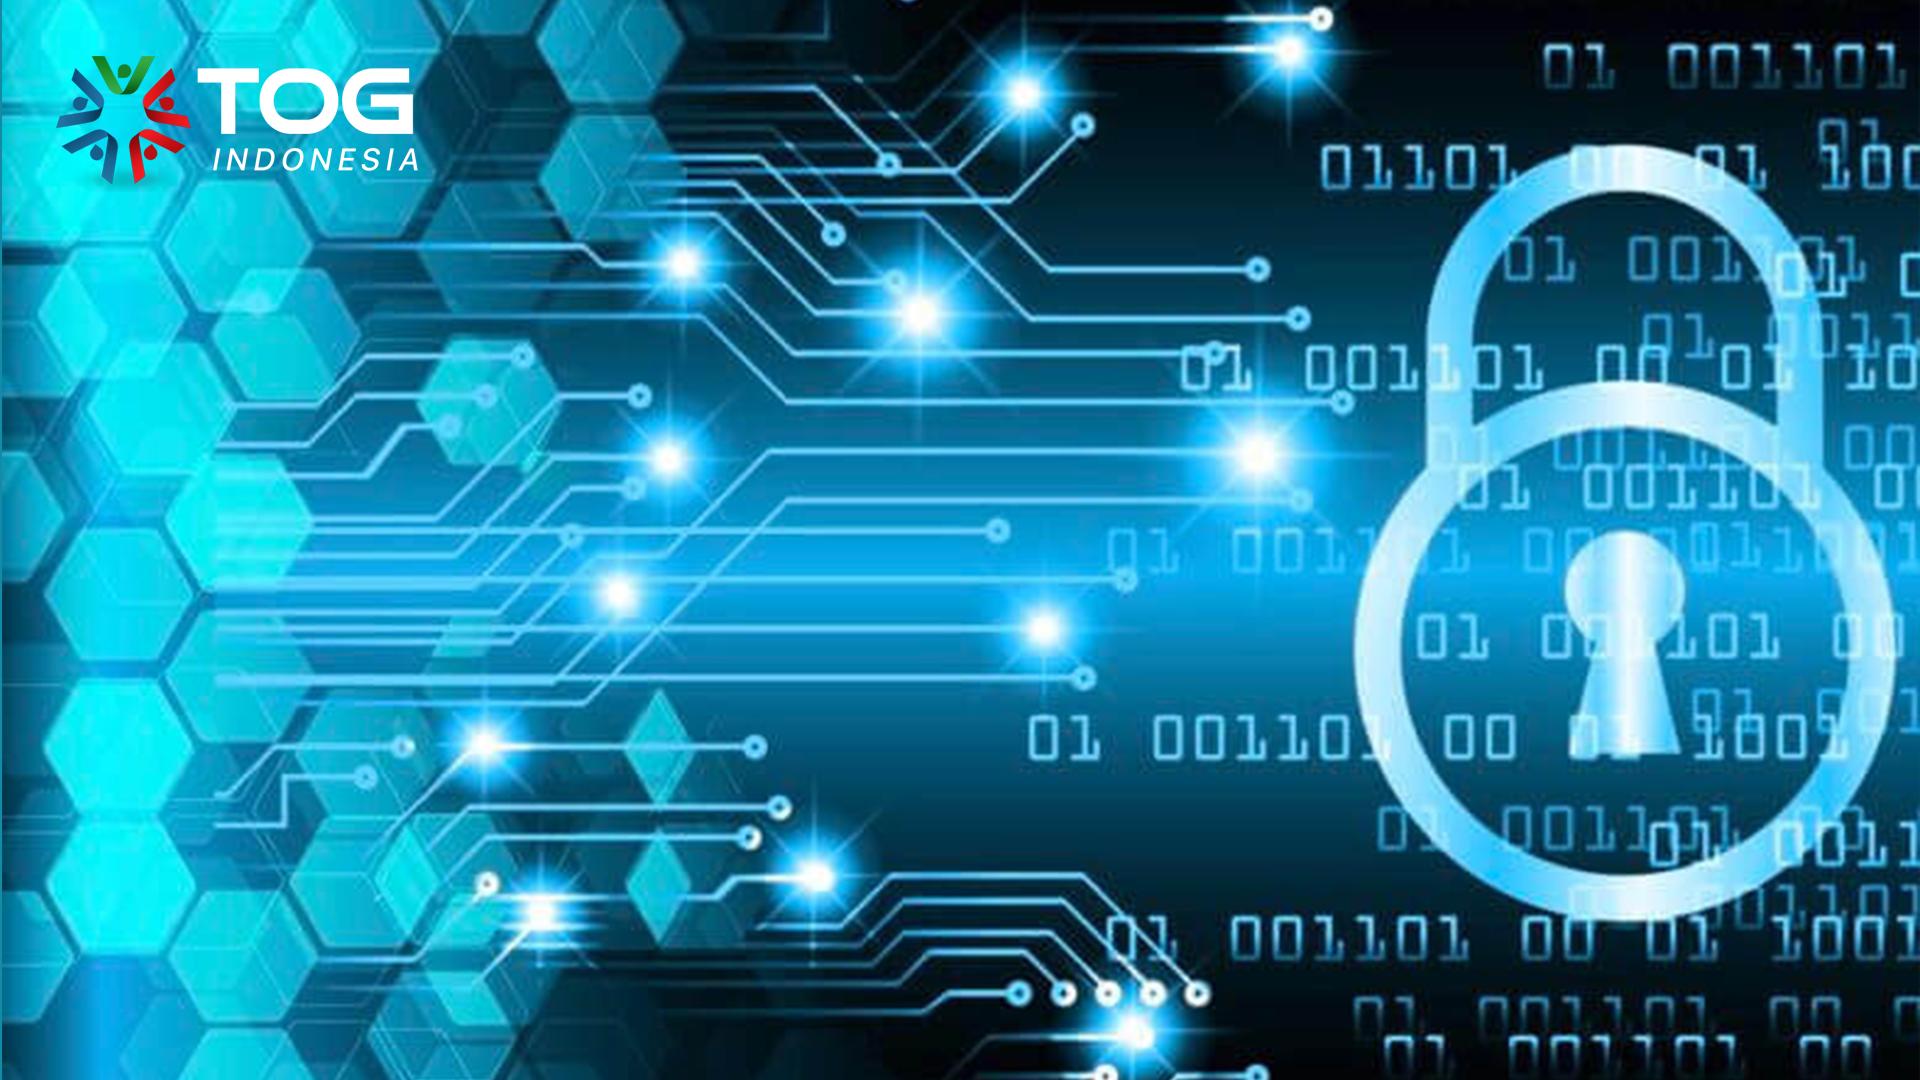 Lowongan IT Security di Jakarta Tahun 2020